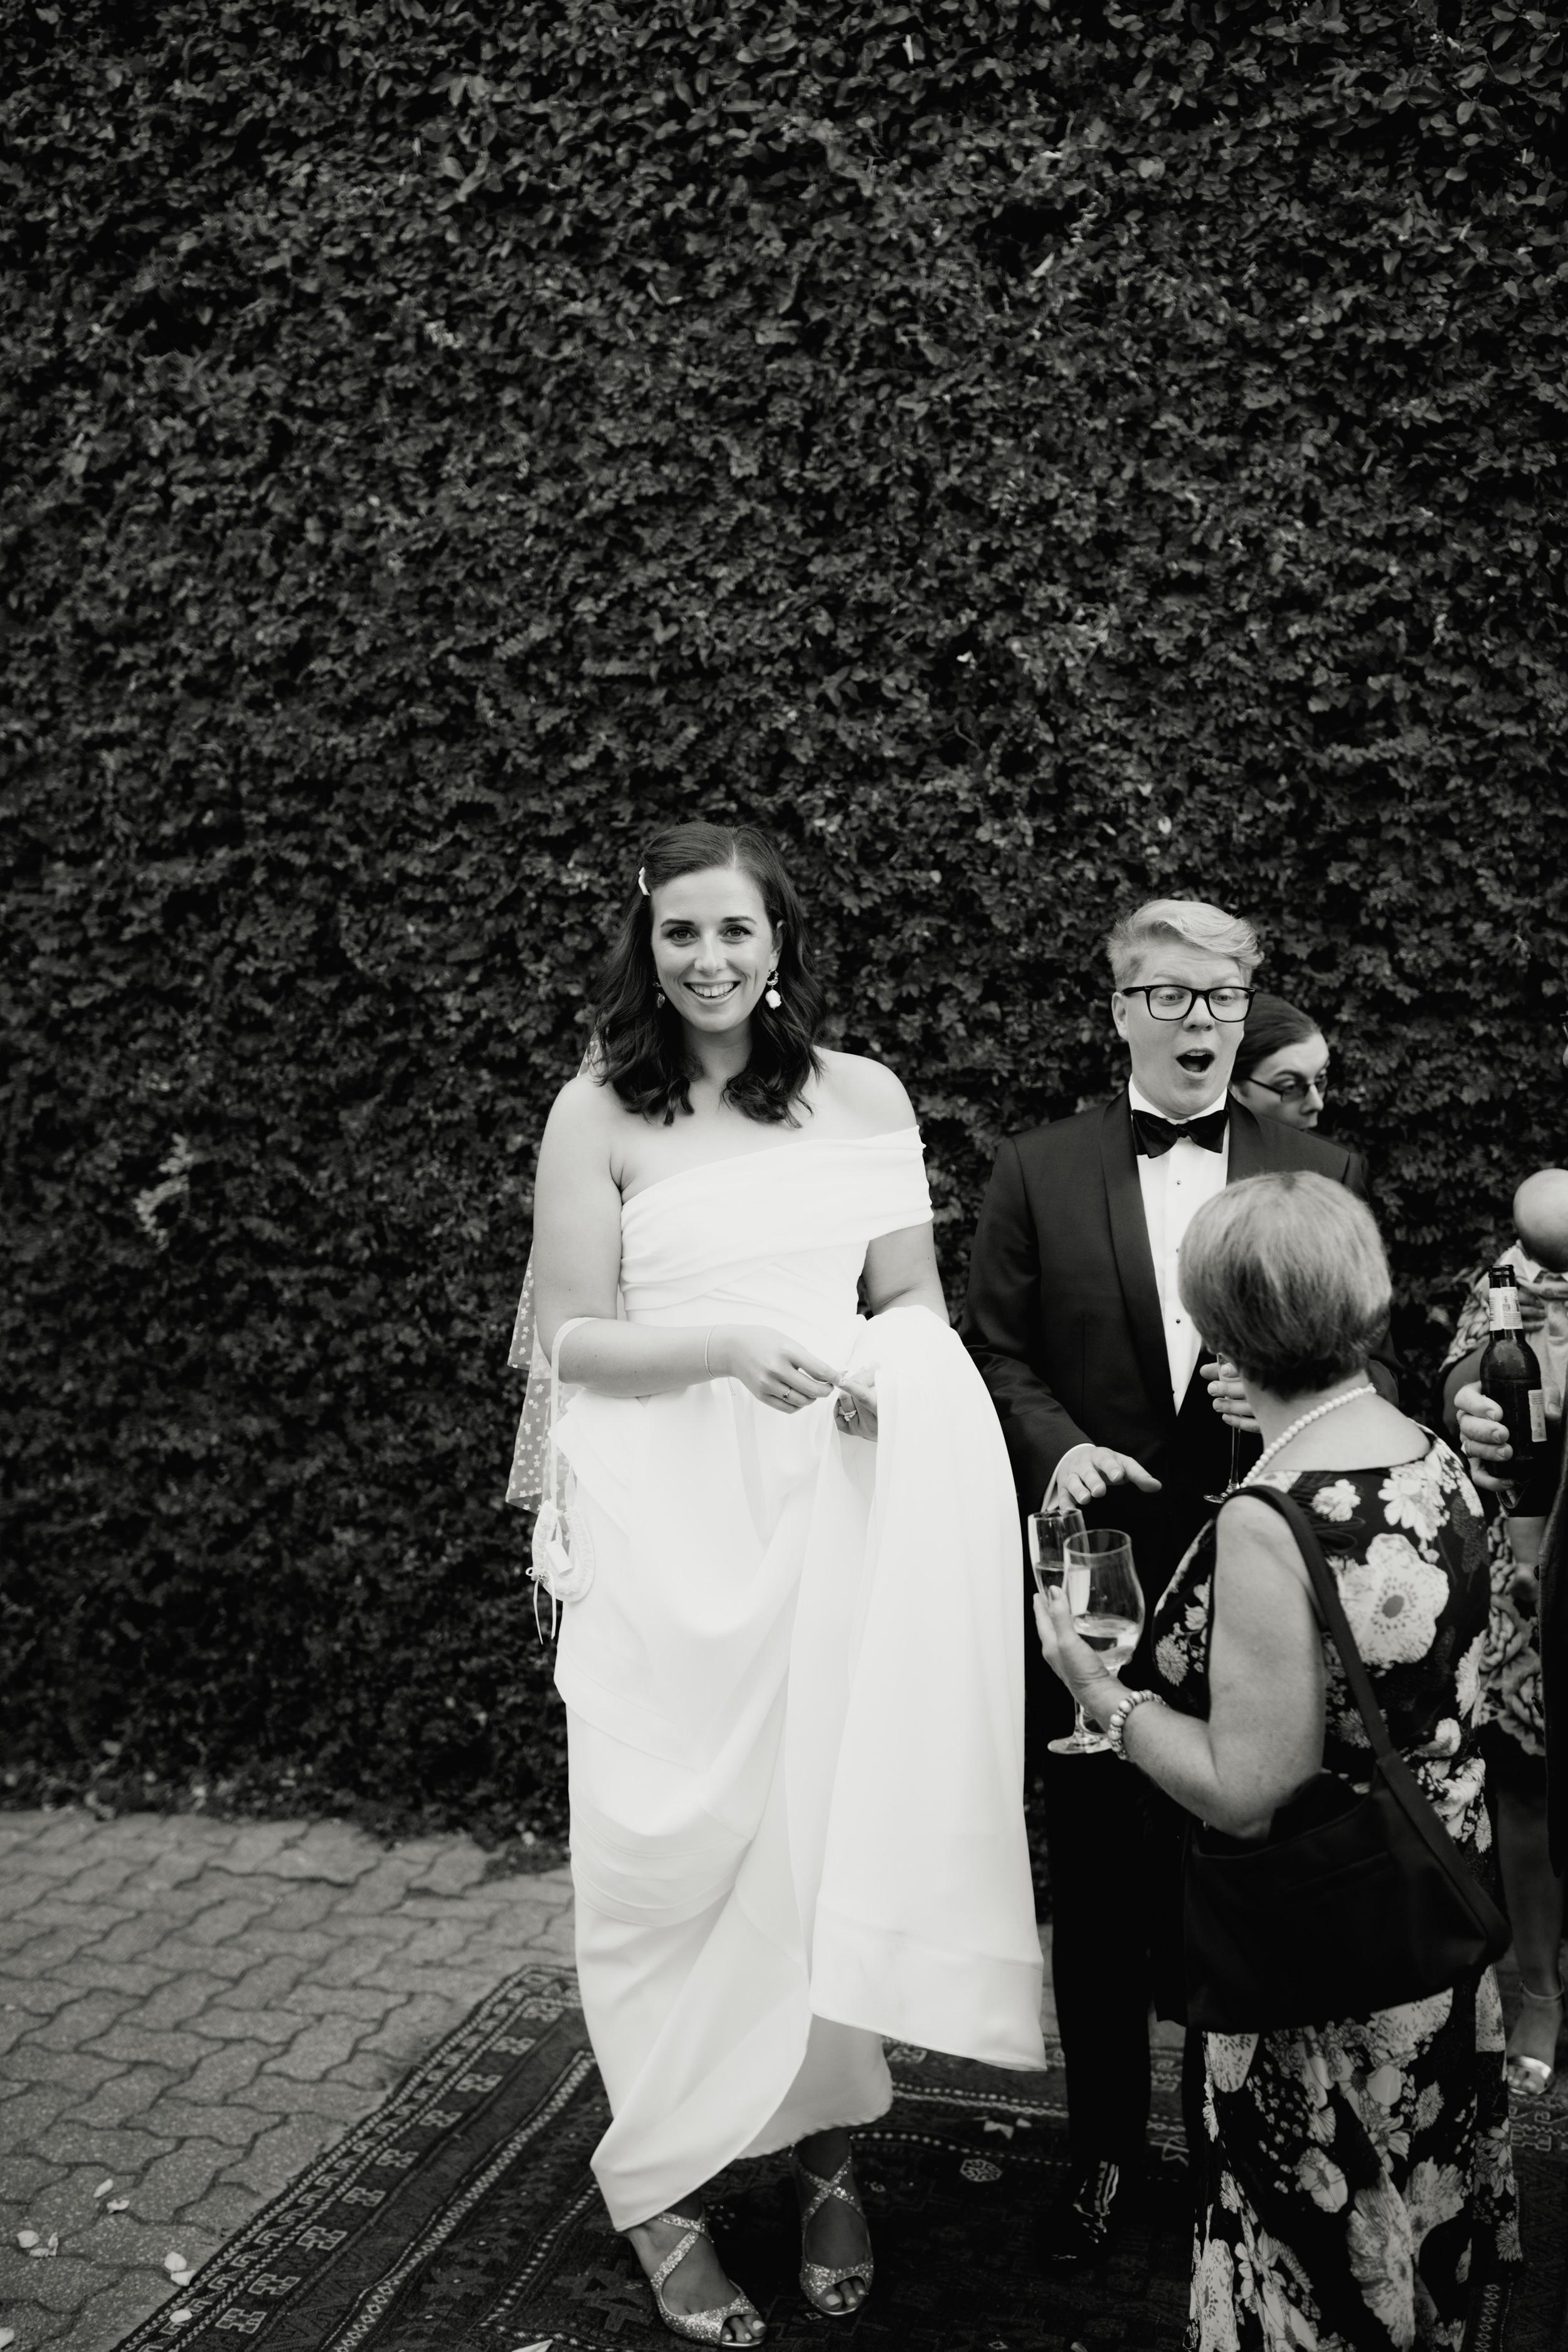 I-Got-You-Babe-Weddings-Tahlia&Mitch-Butler-Lane-Wedding0130.JPG